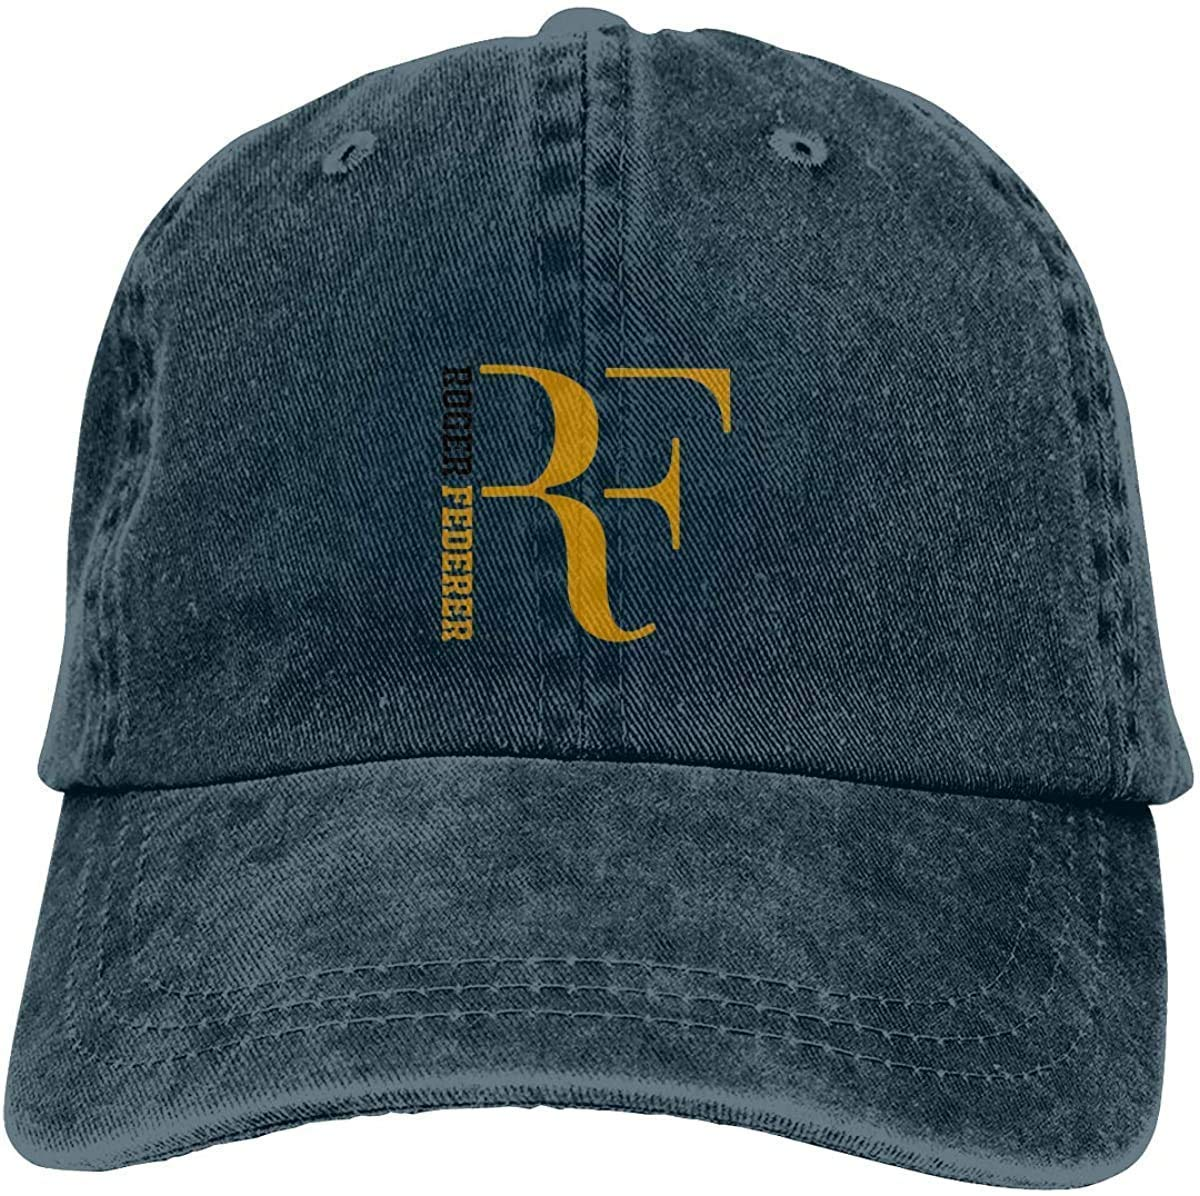 IIFENGLE Baseball Cap Sports Cowboy Hat Adult Retro Baseball Cap Adjustable Roger Federer RF Logo s Black